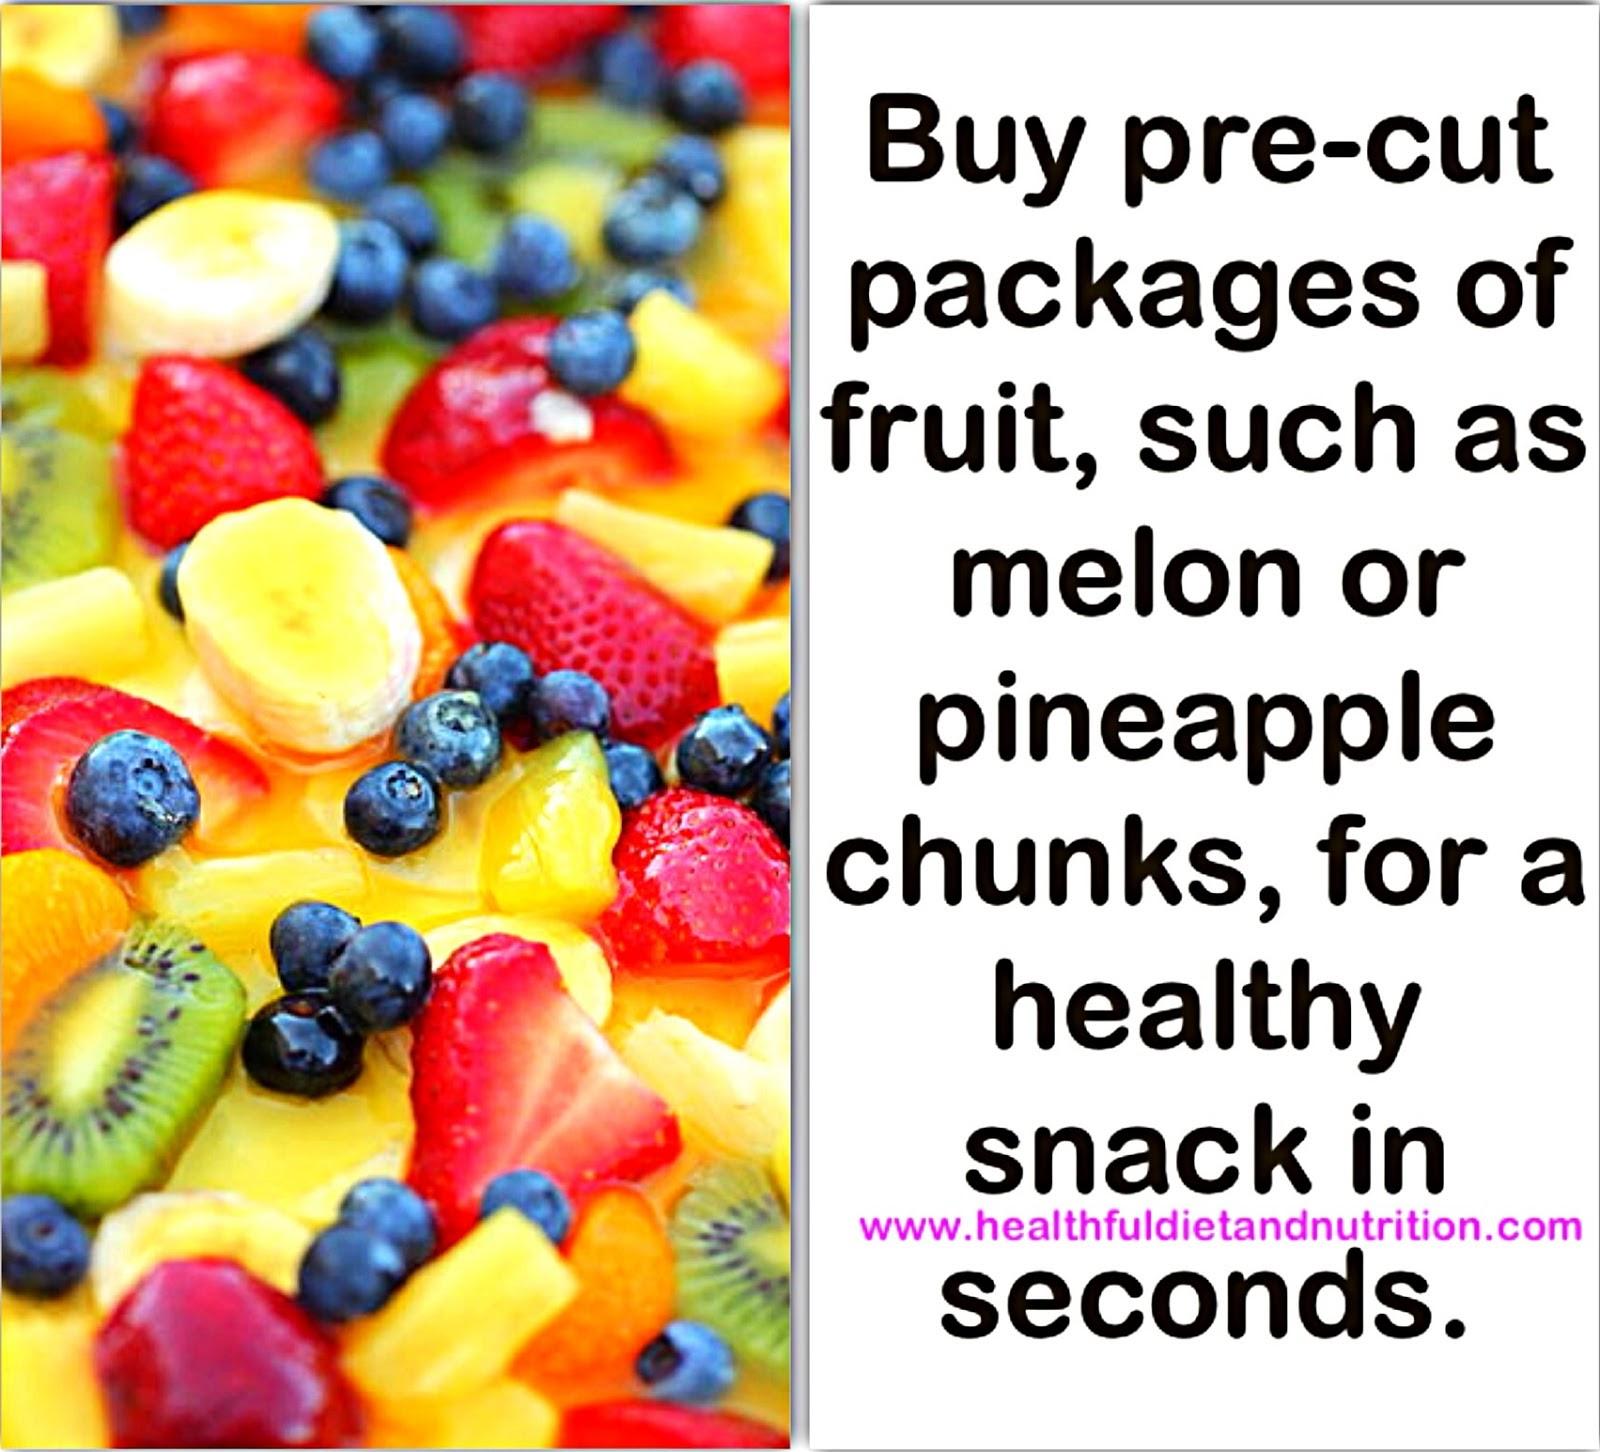 Buy Pre-Cut Packages of Fruits